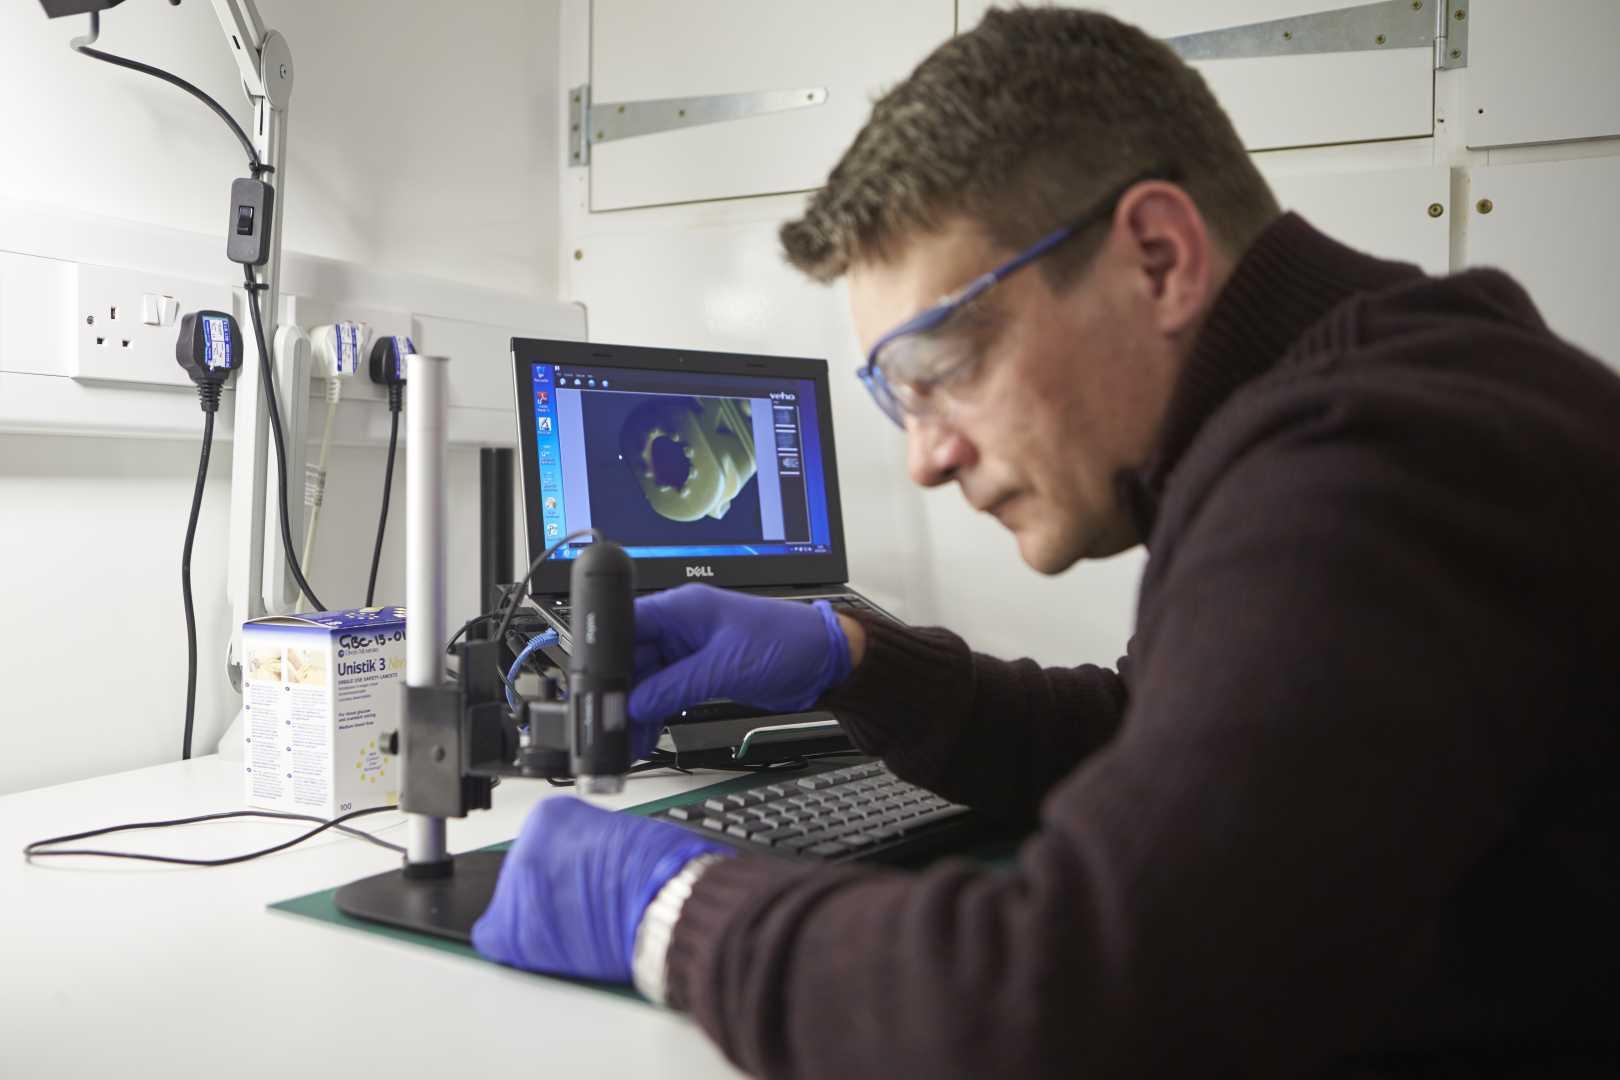 Owen Mumford: Behind the scenes: R&D in medical device design 4